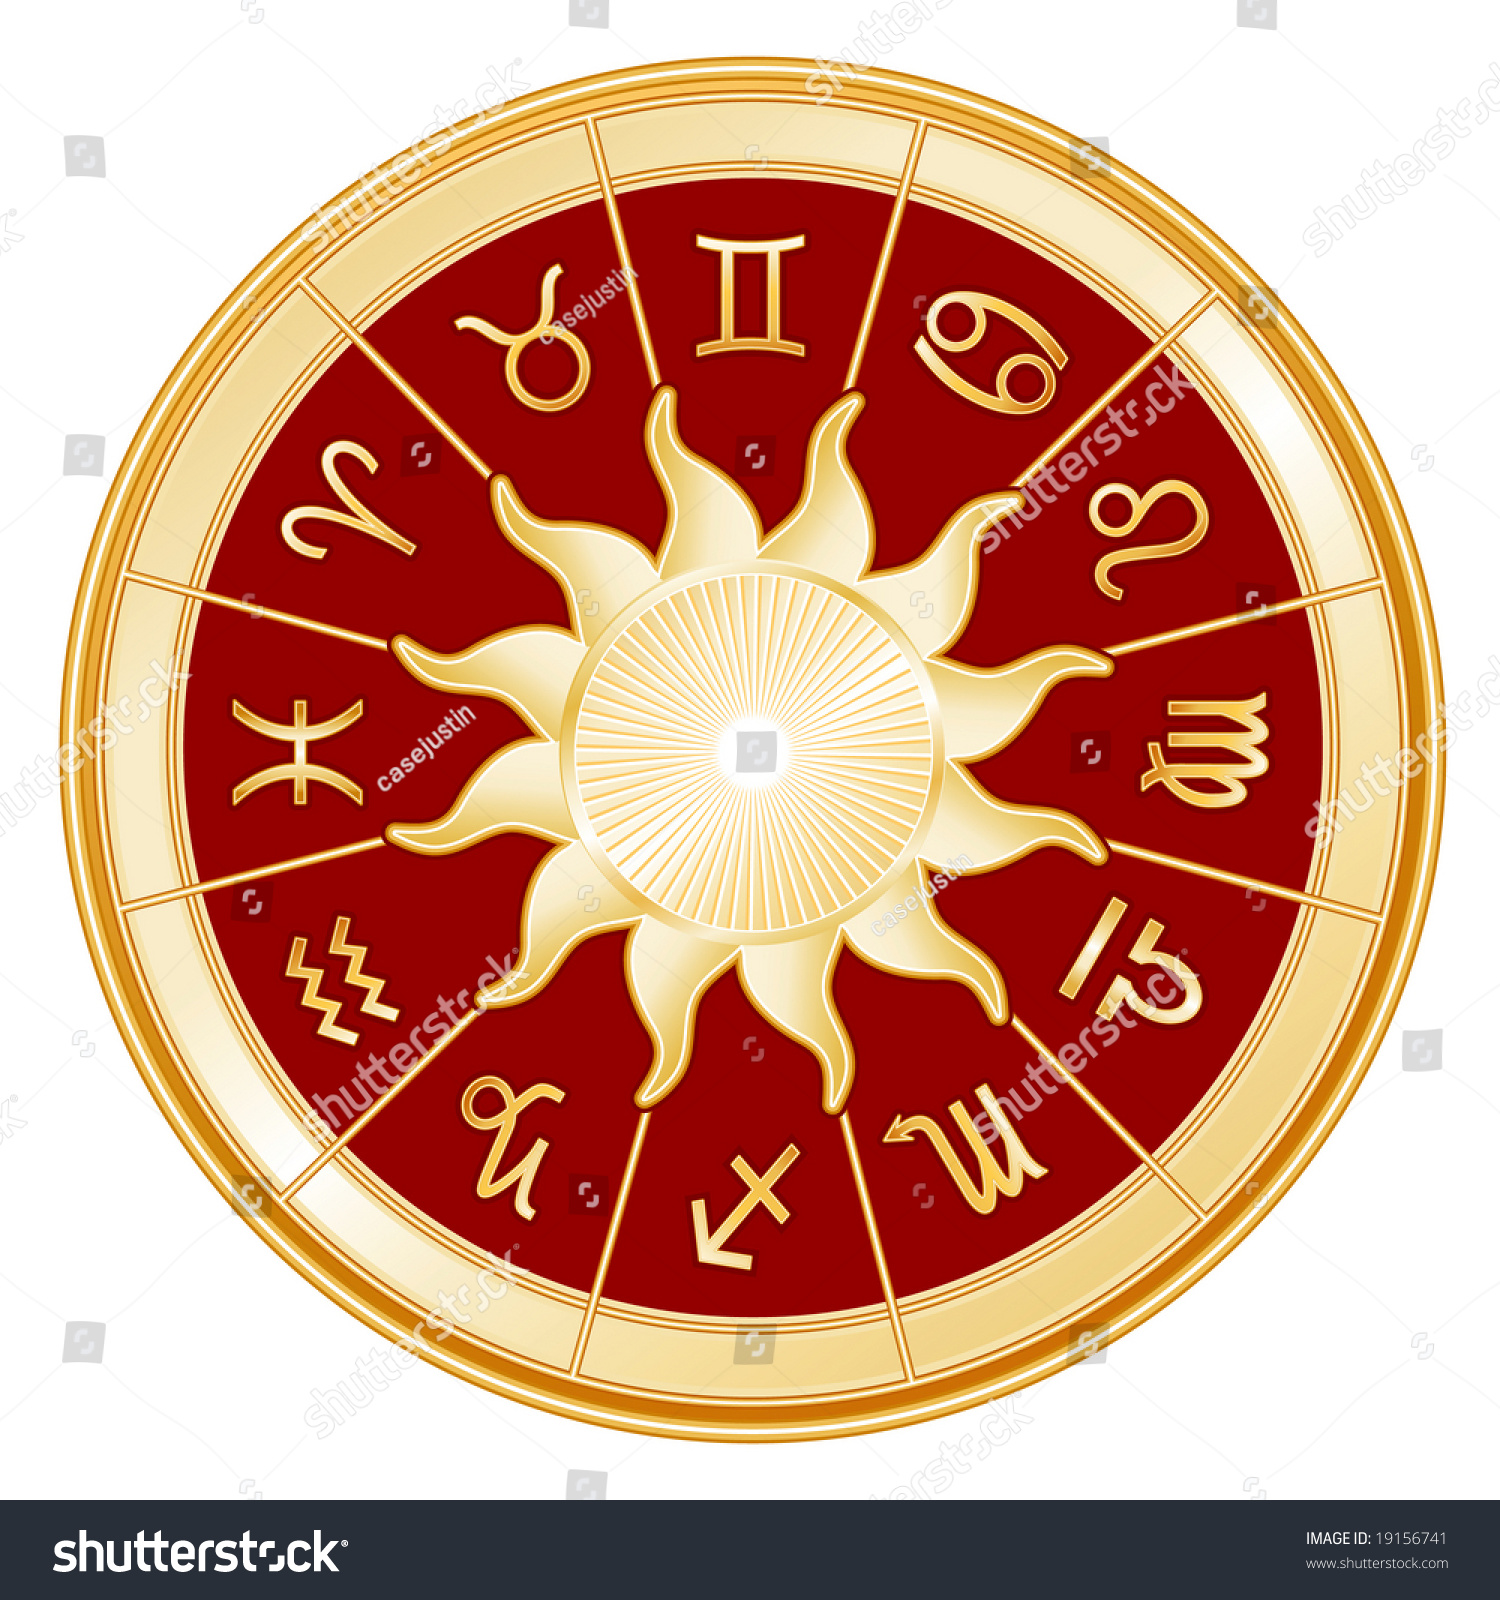 horoscope signs zodiac 12 astrology symbols stock illustration 19156741 shutterstock. Black Bedroom Furniture Sets. Home Design Ideas